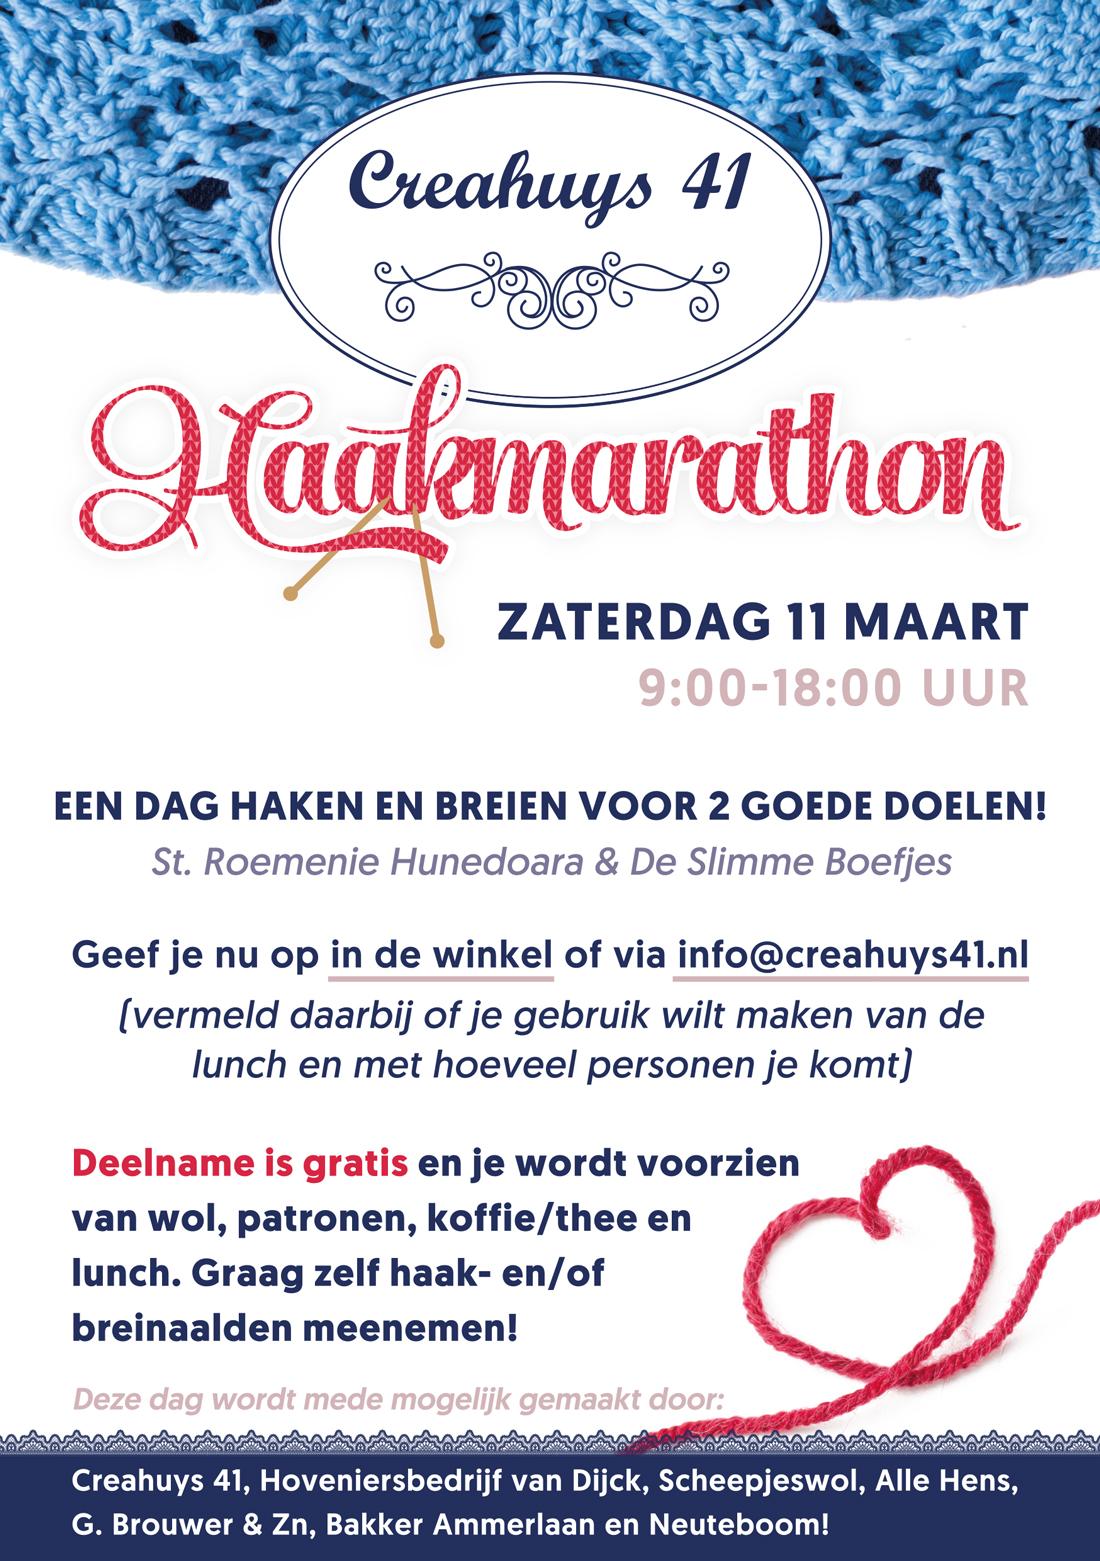 Creahuys41_Haakmarathon-advertentie_Facebook